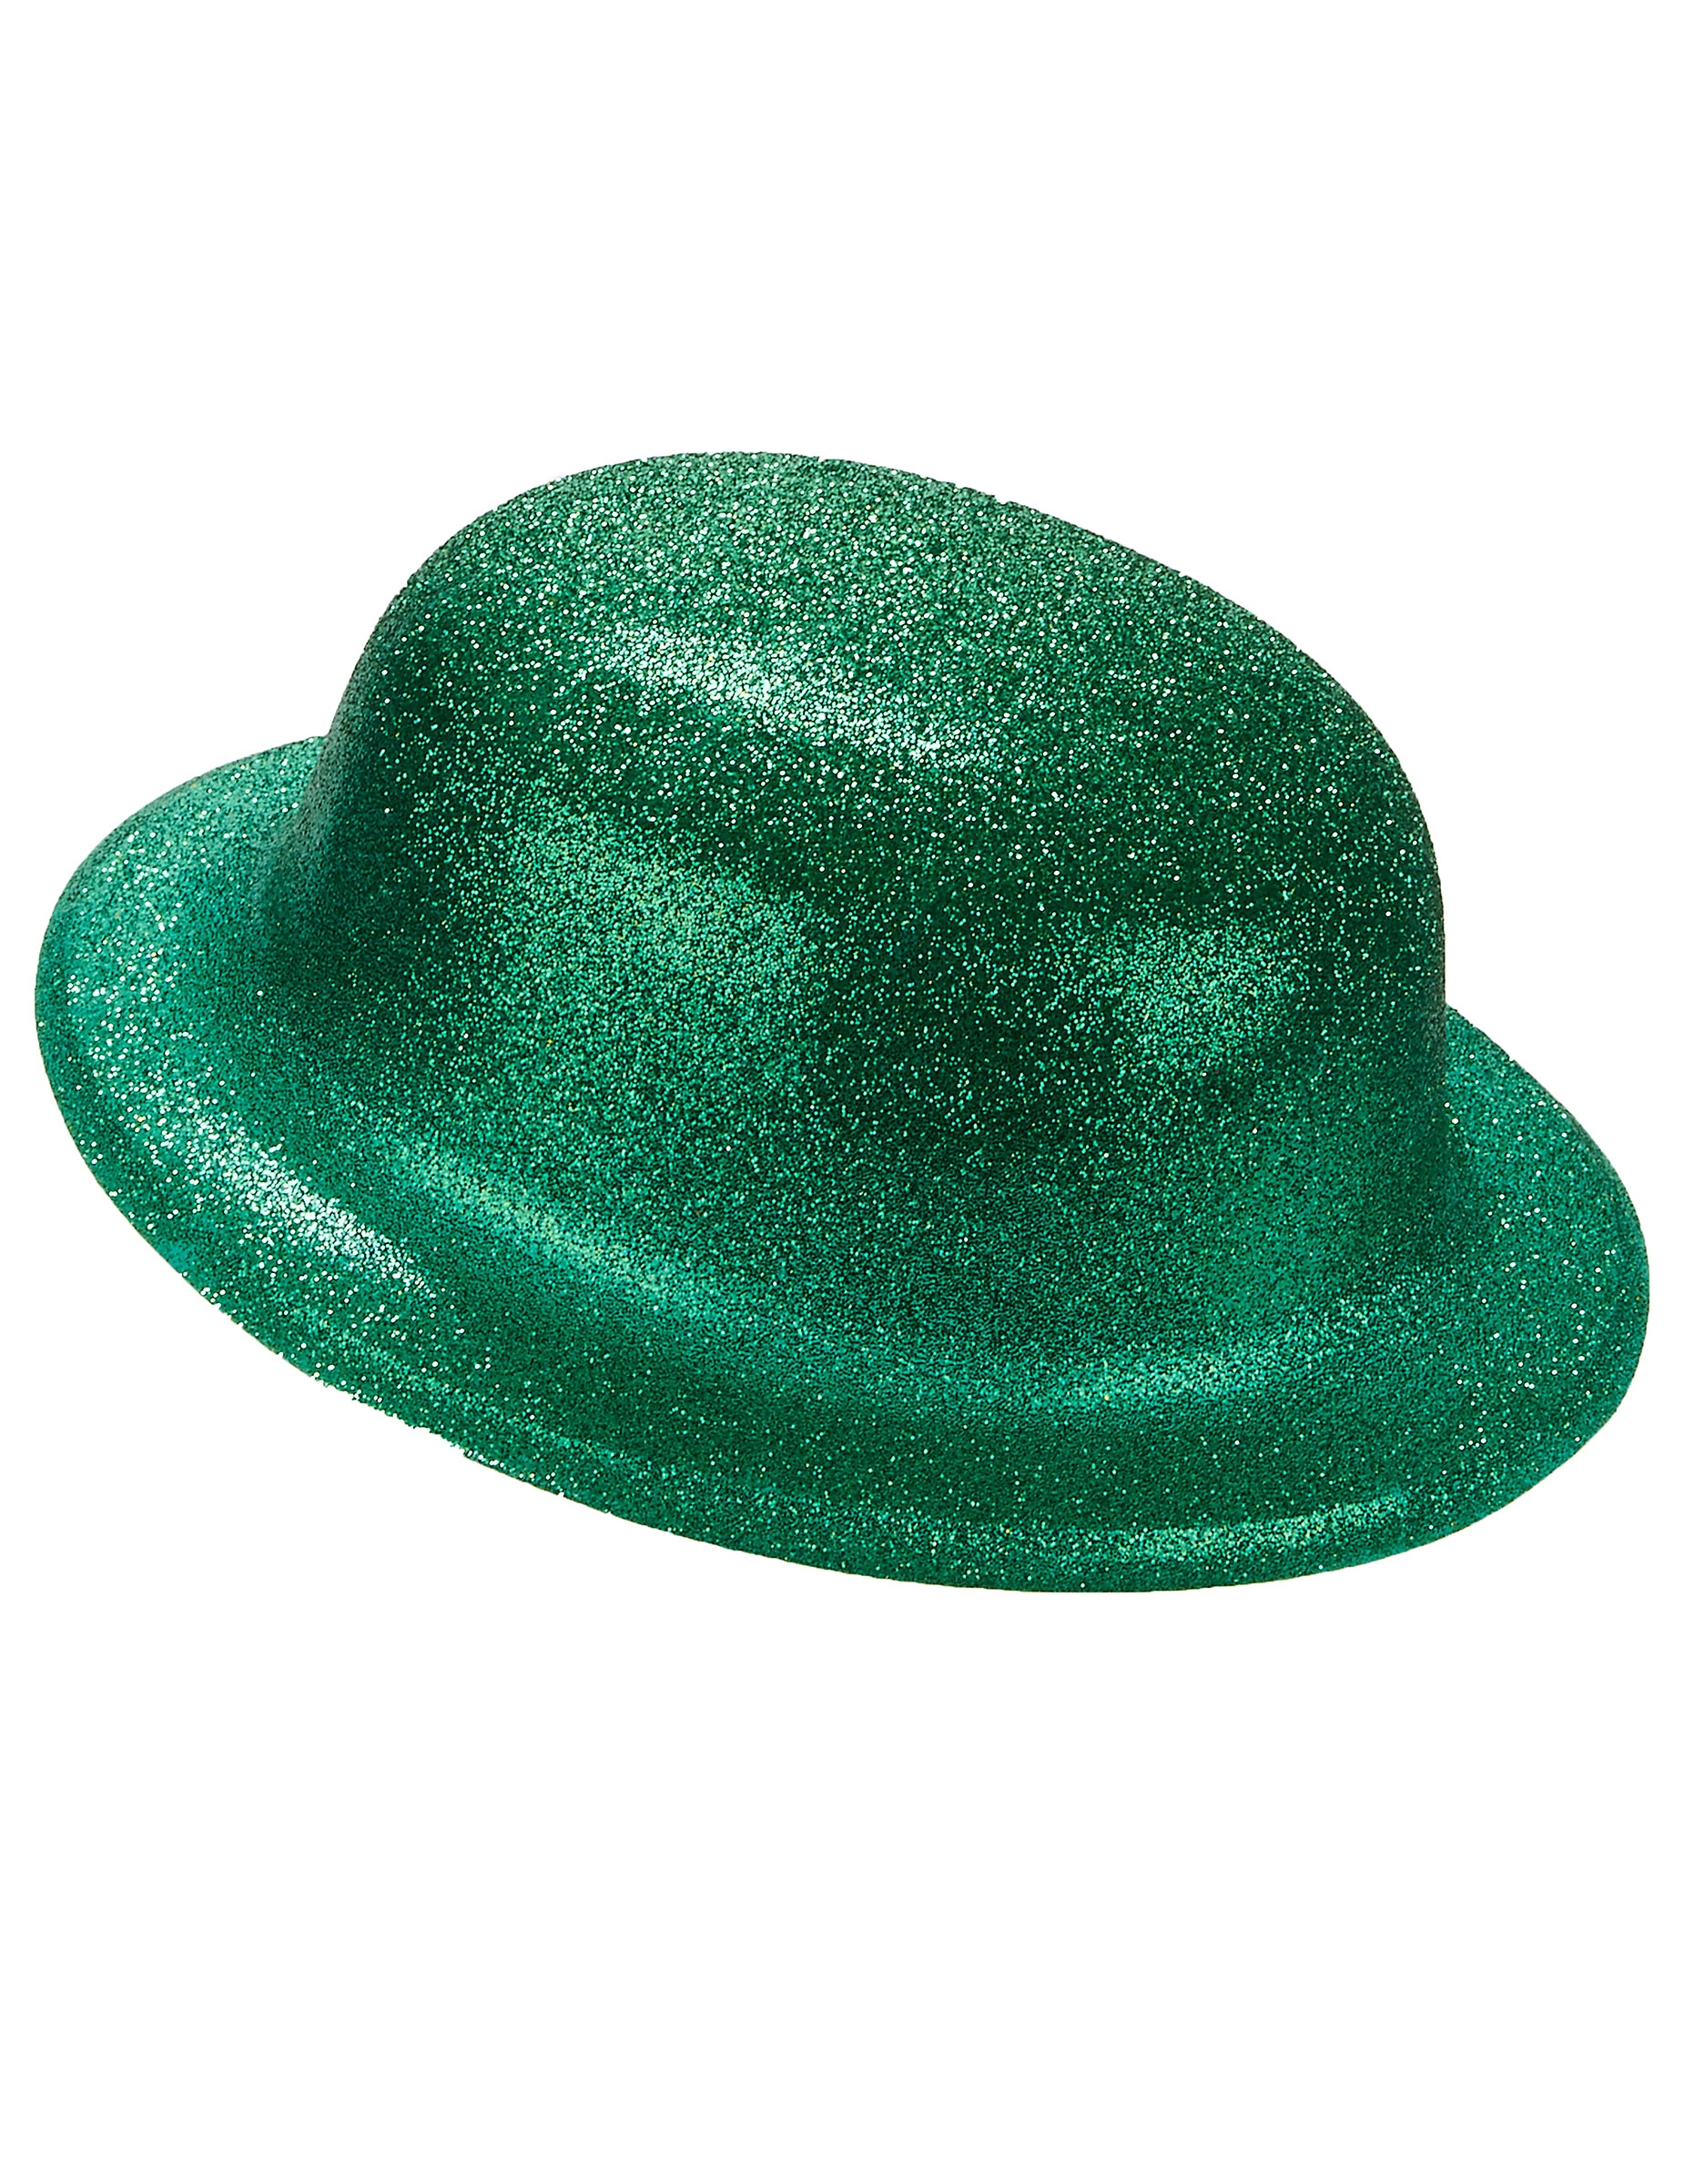 721813c900bf4 Sombrero bombín verde purpurina adulto  Sombreros